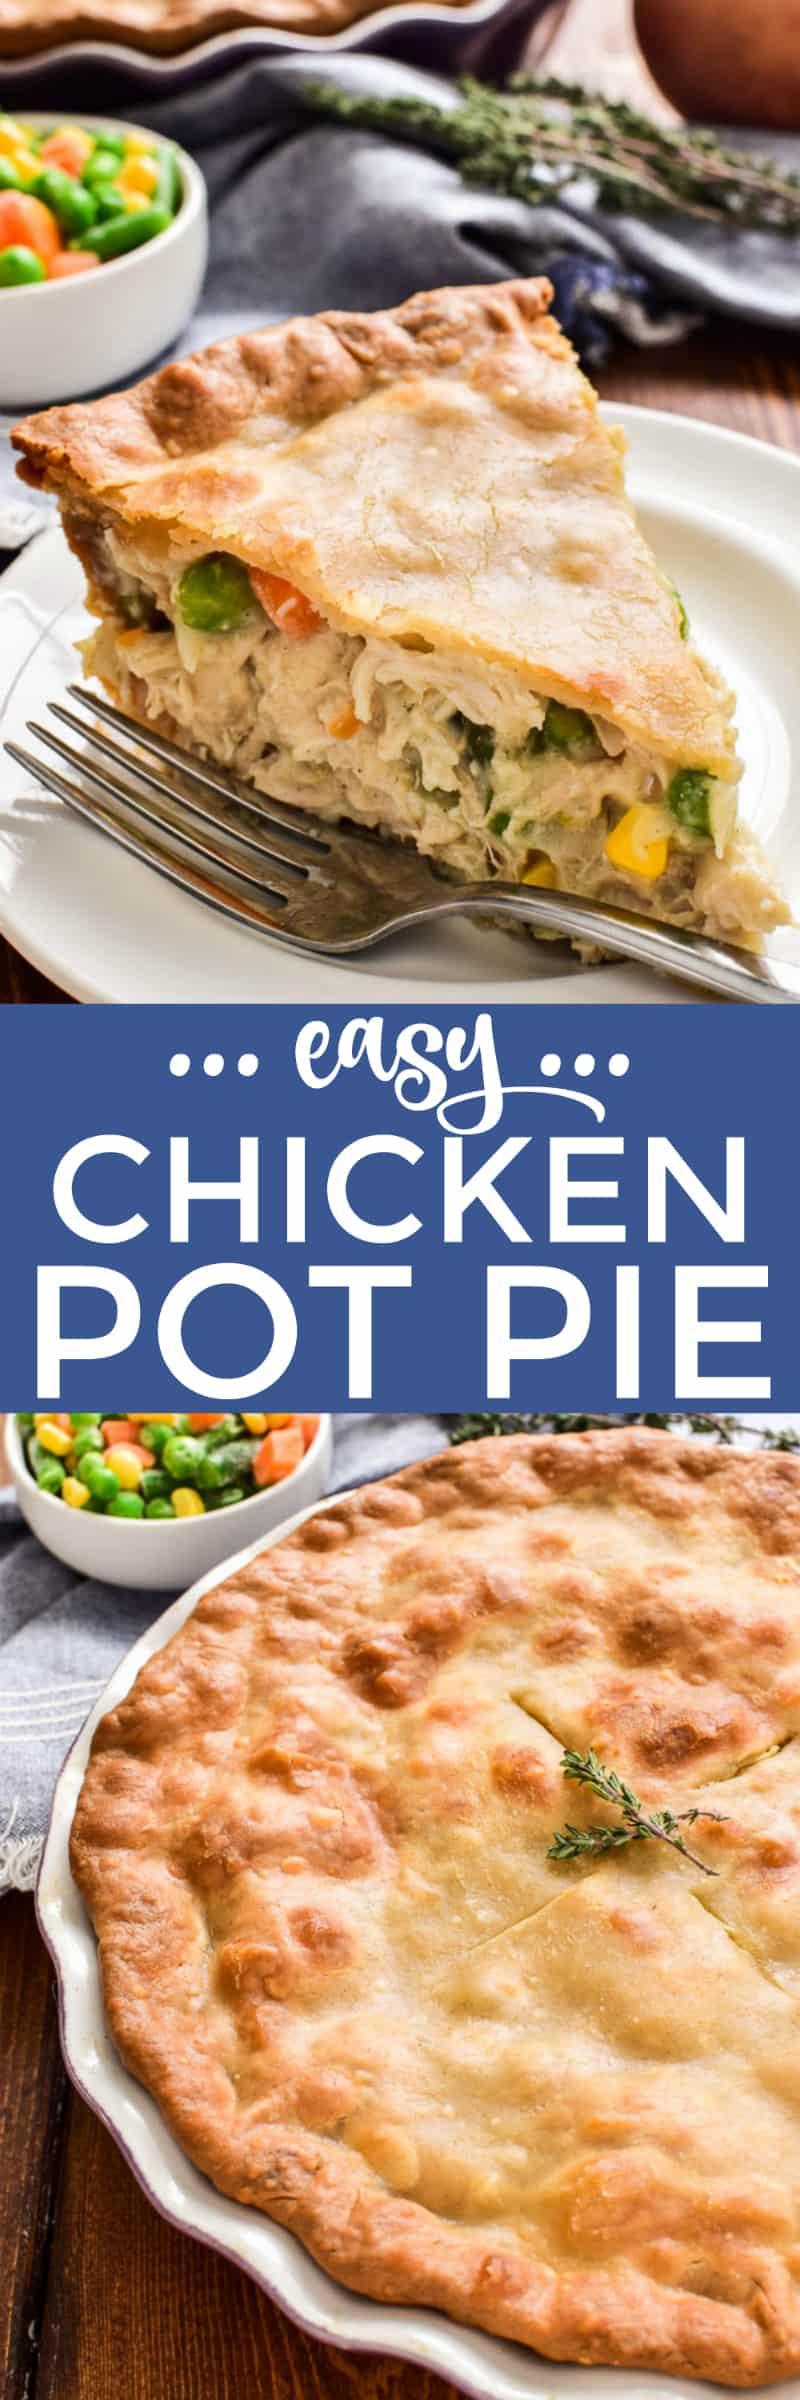 Collage image of Chicken Pot Pie